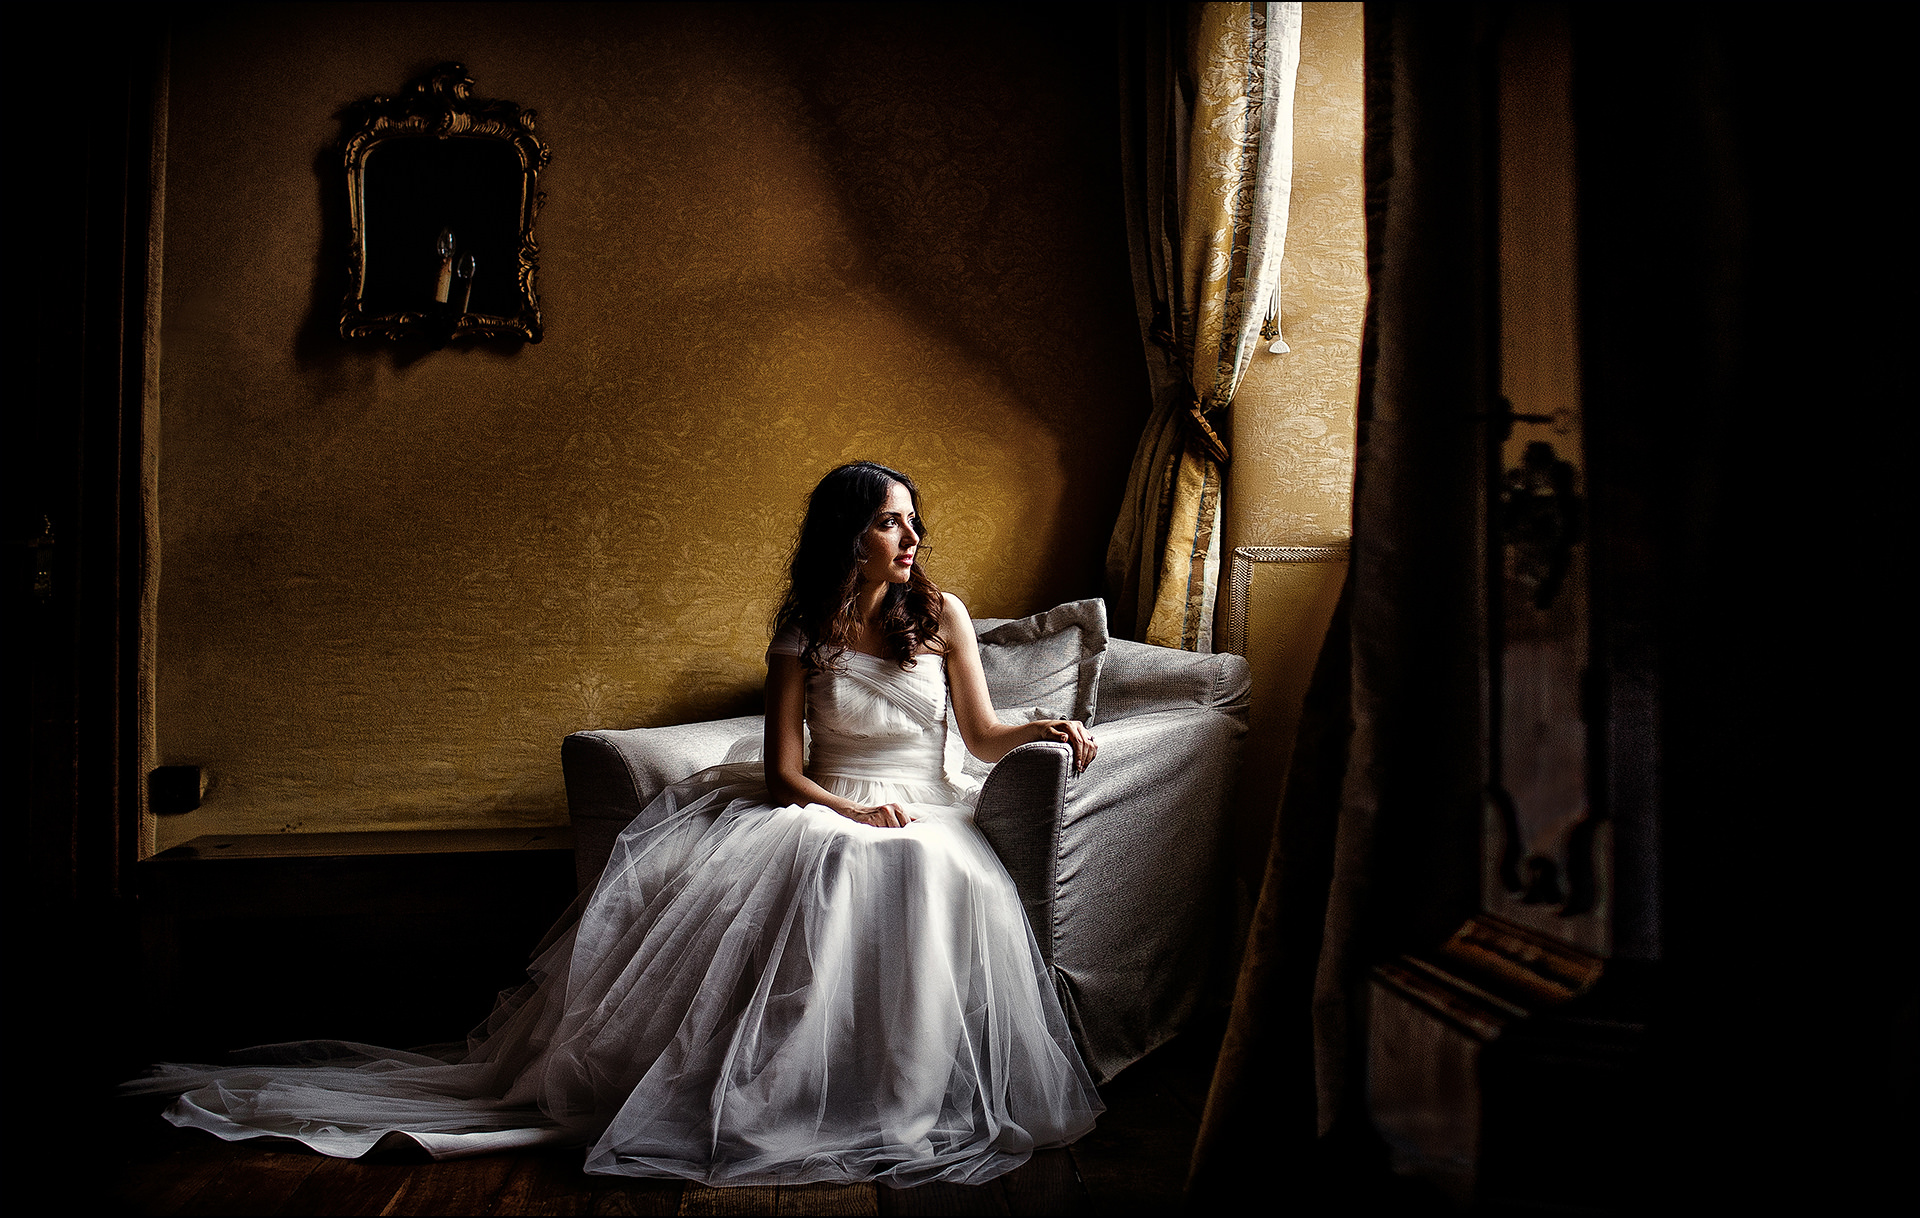 Hochzeitsfotograf Schlosshotel Hugenpoet